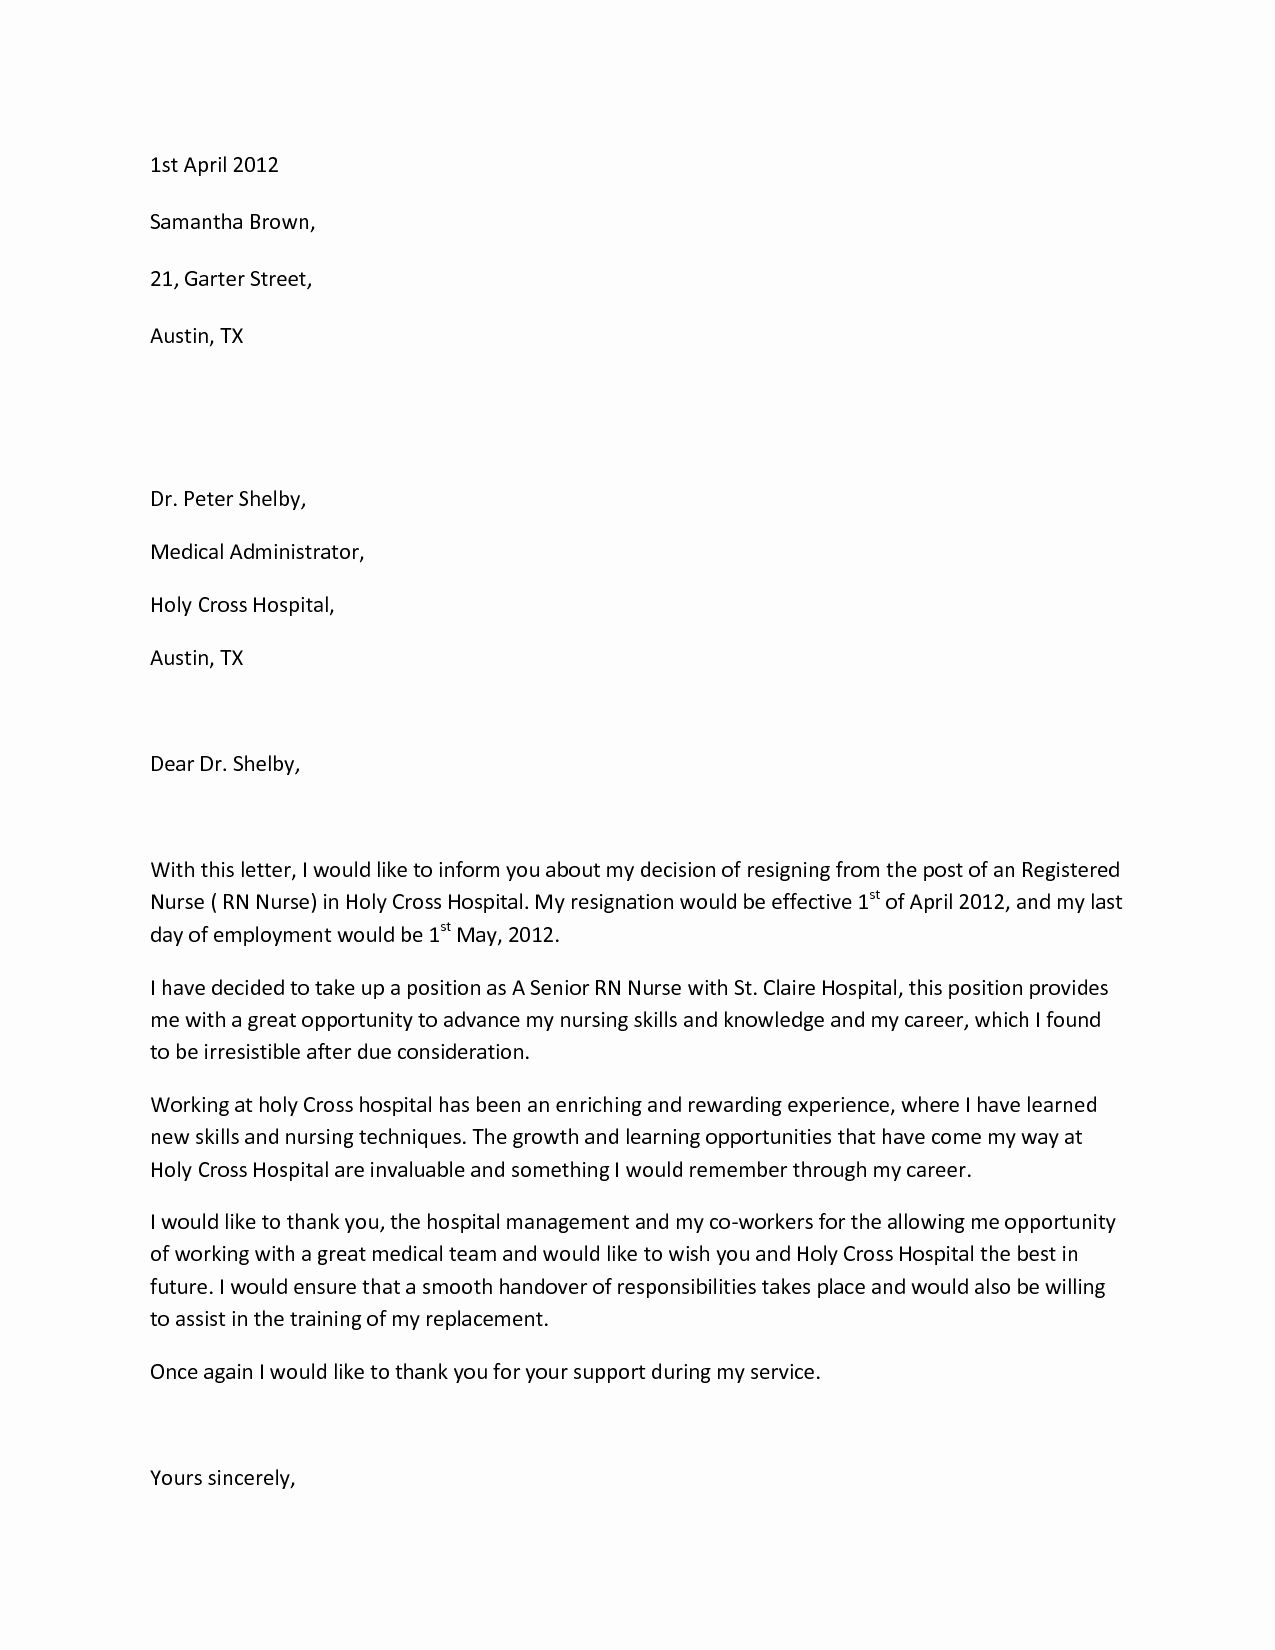 Registered Nurse Resignation Letter Sample from i.pinimg.com